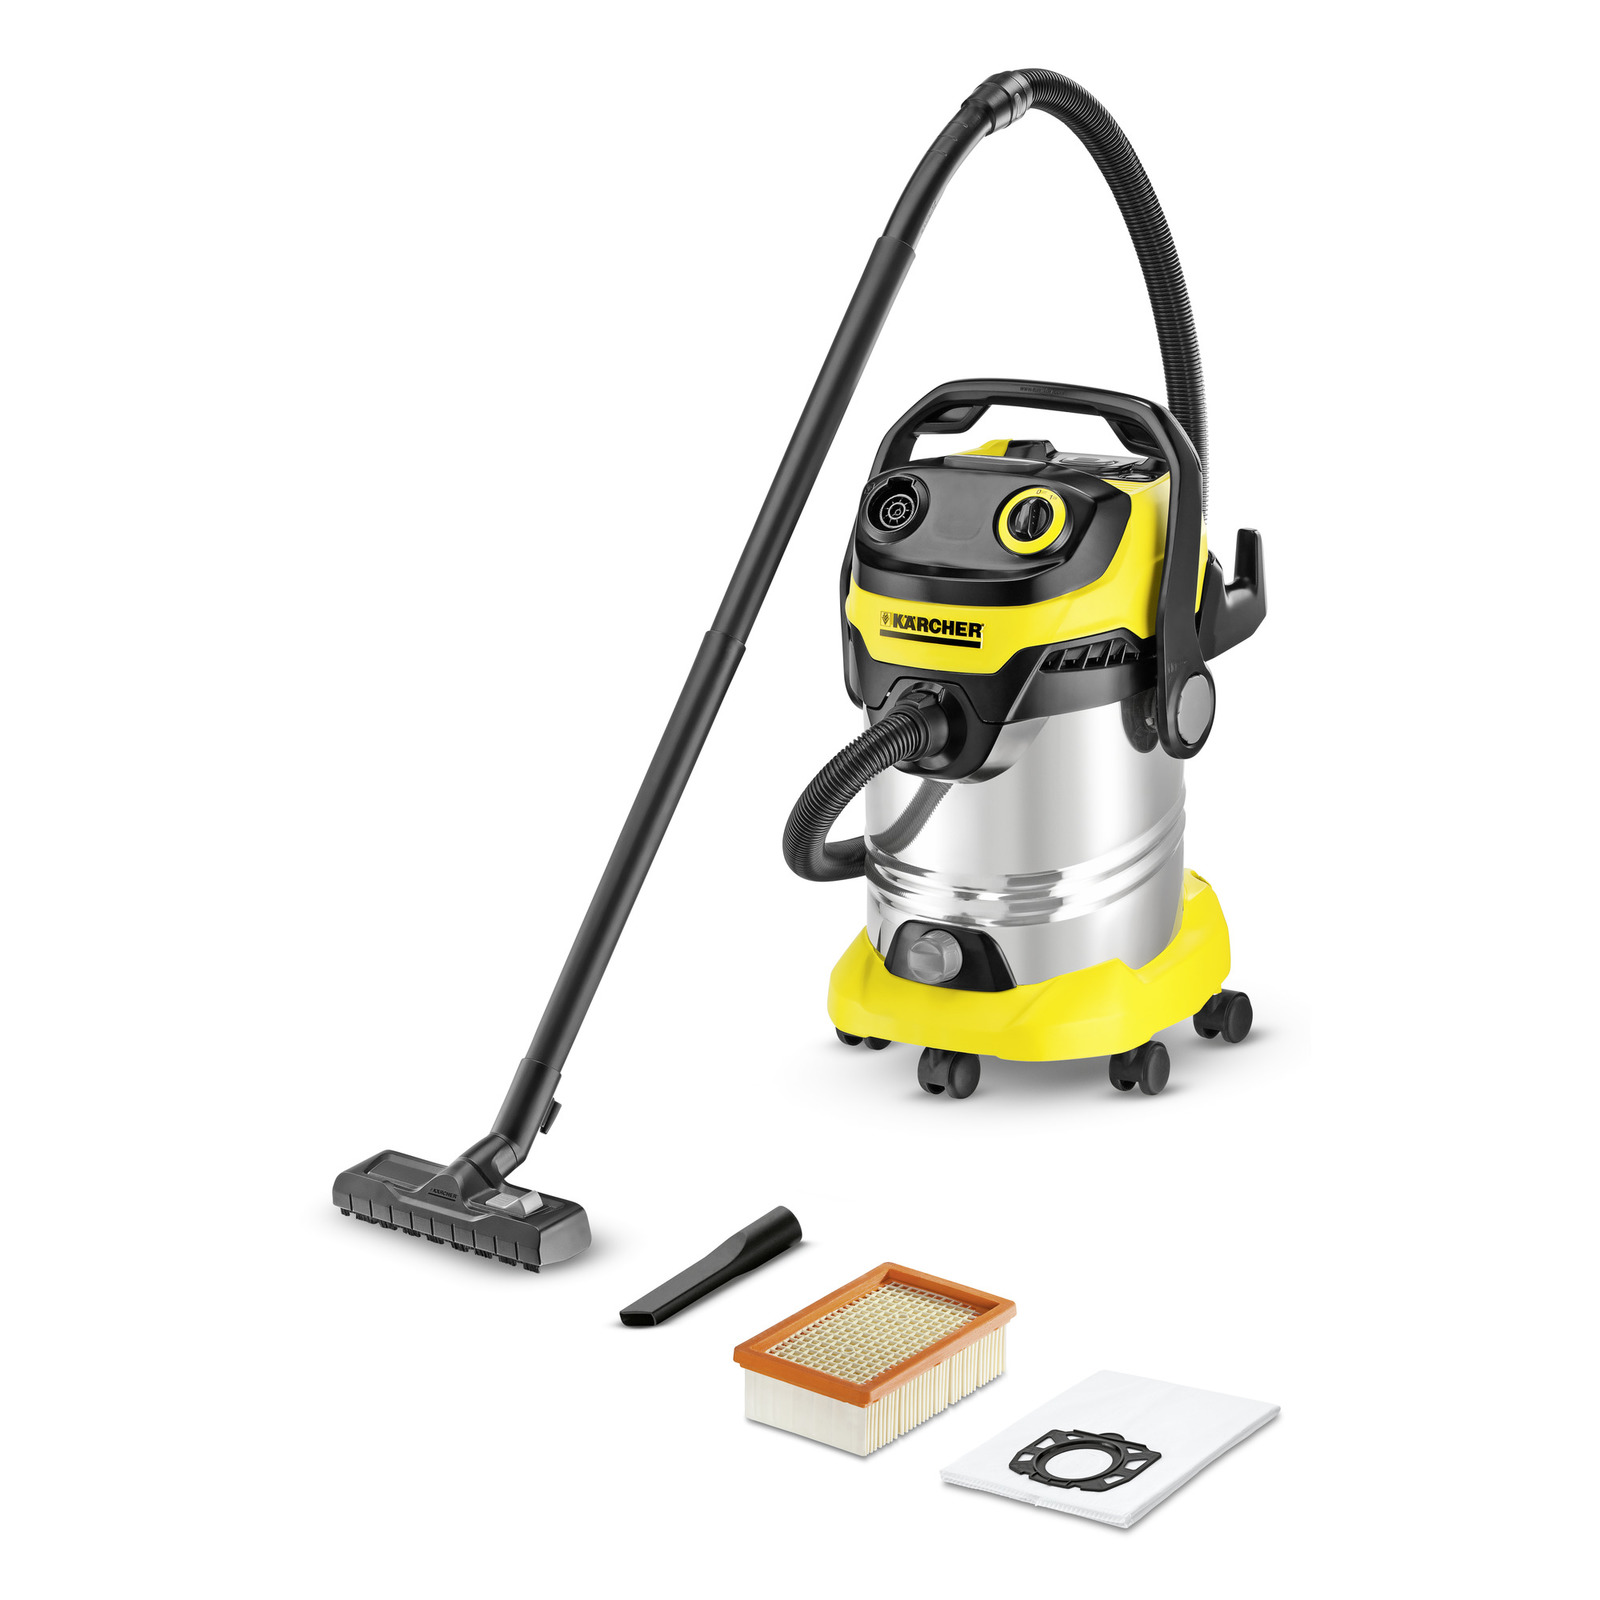 multi purpose vacuum cleaners home garden karcher. Black Bedroom Furniture Sets. Home Design Ideas